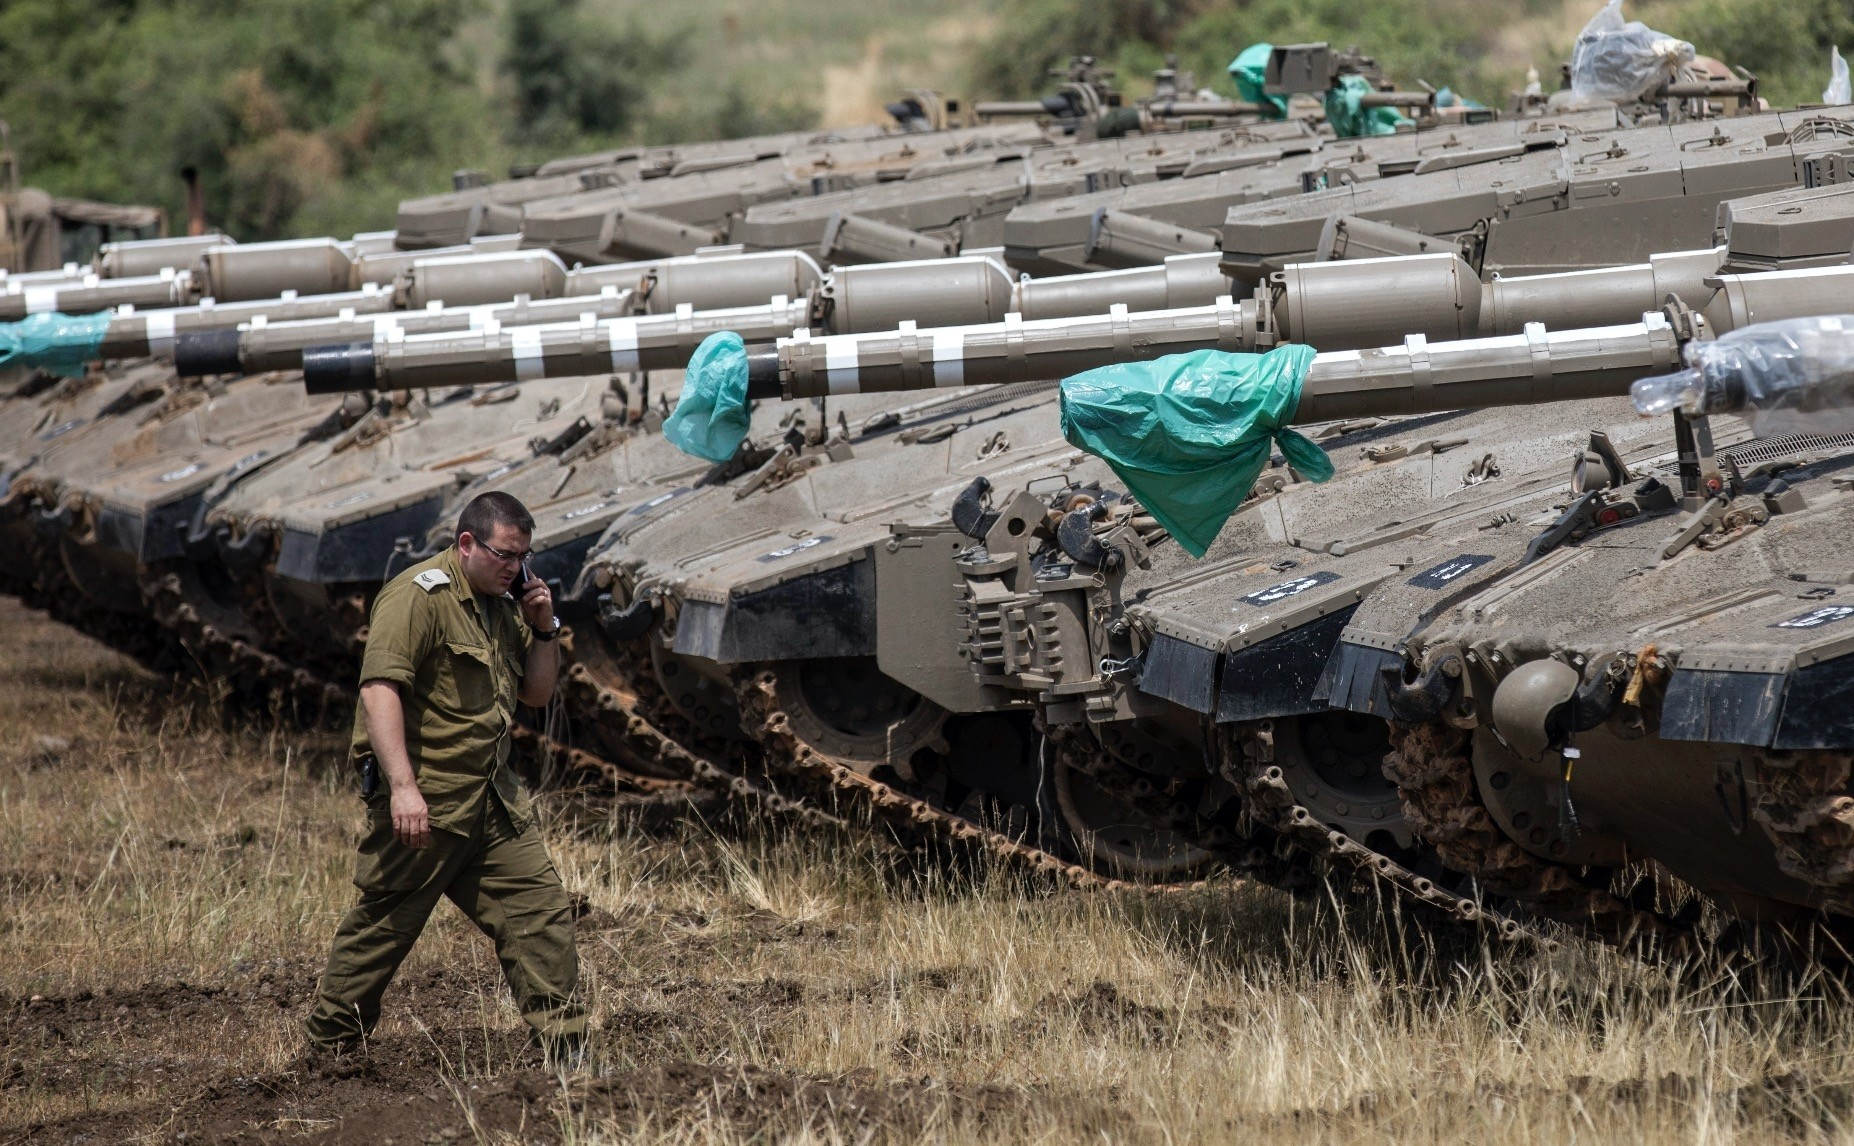 An Israeli soldier walks next to Merkava tanks deployed near the Israeli-Syrian border, Golan Heights, May 9.